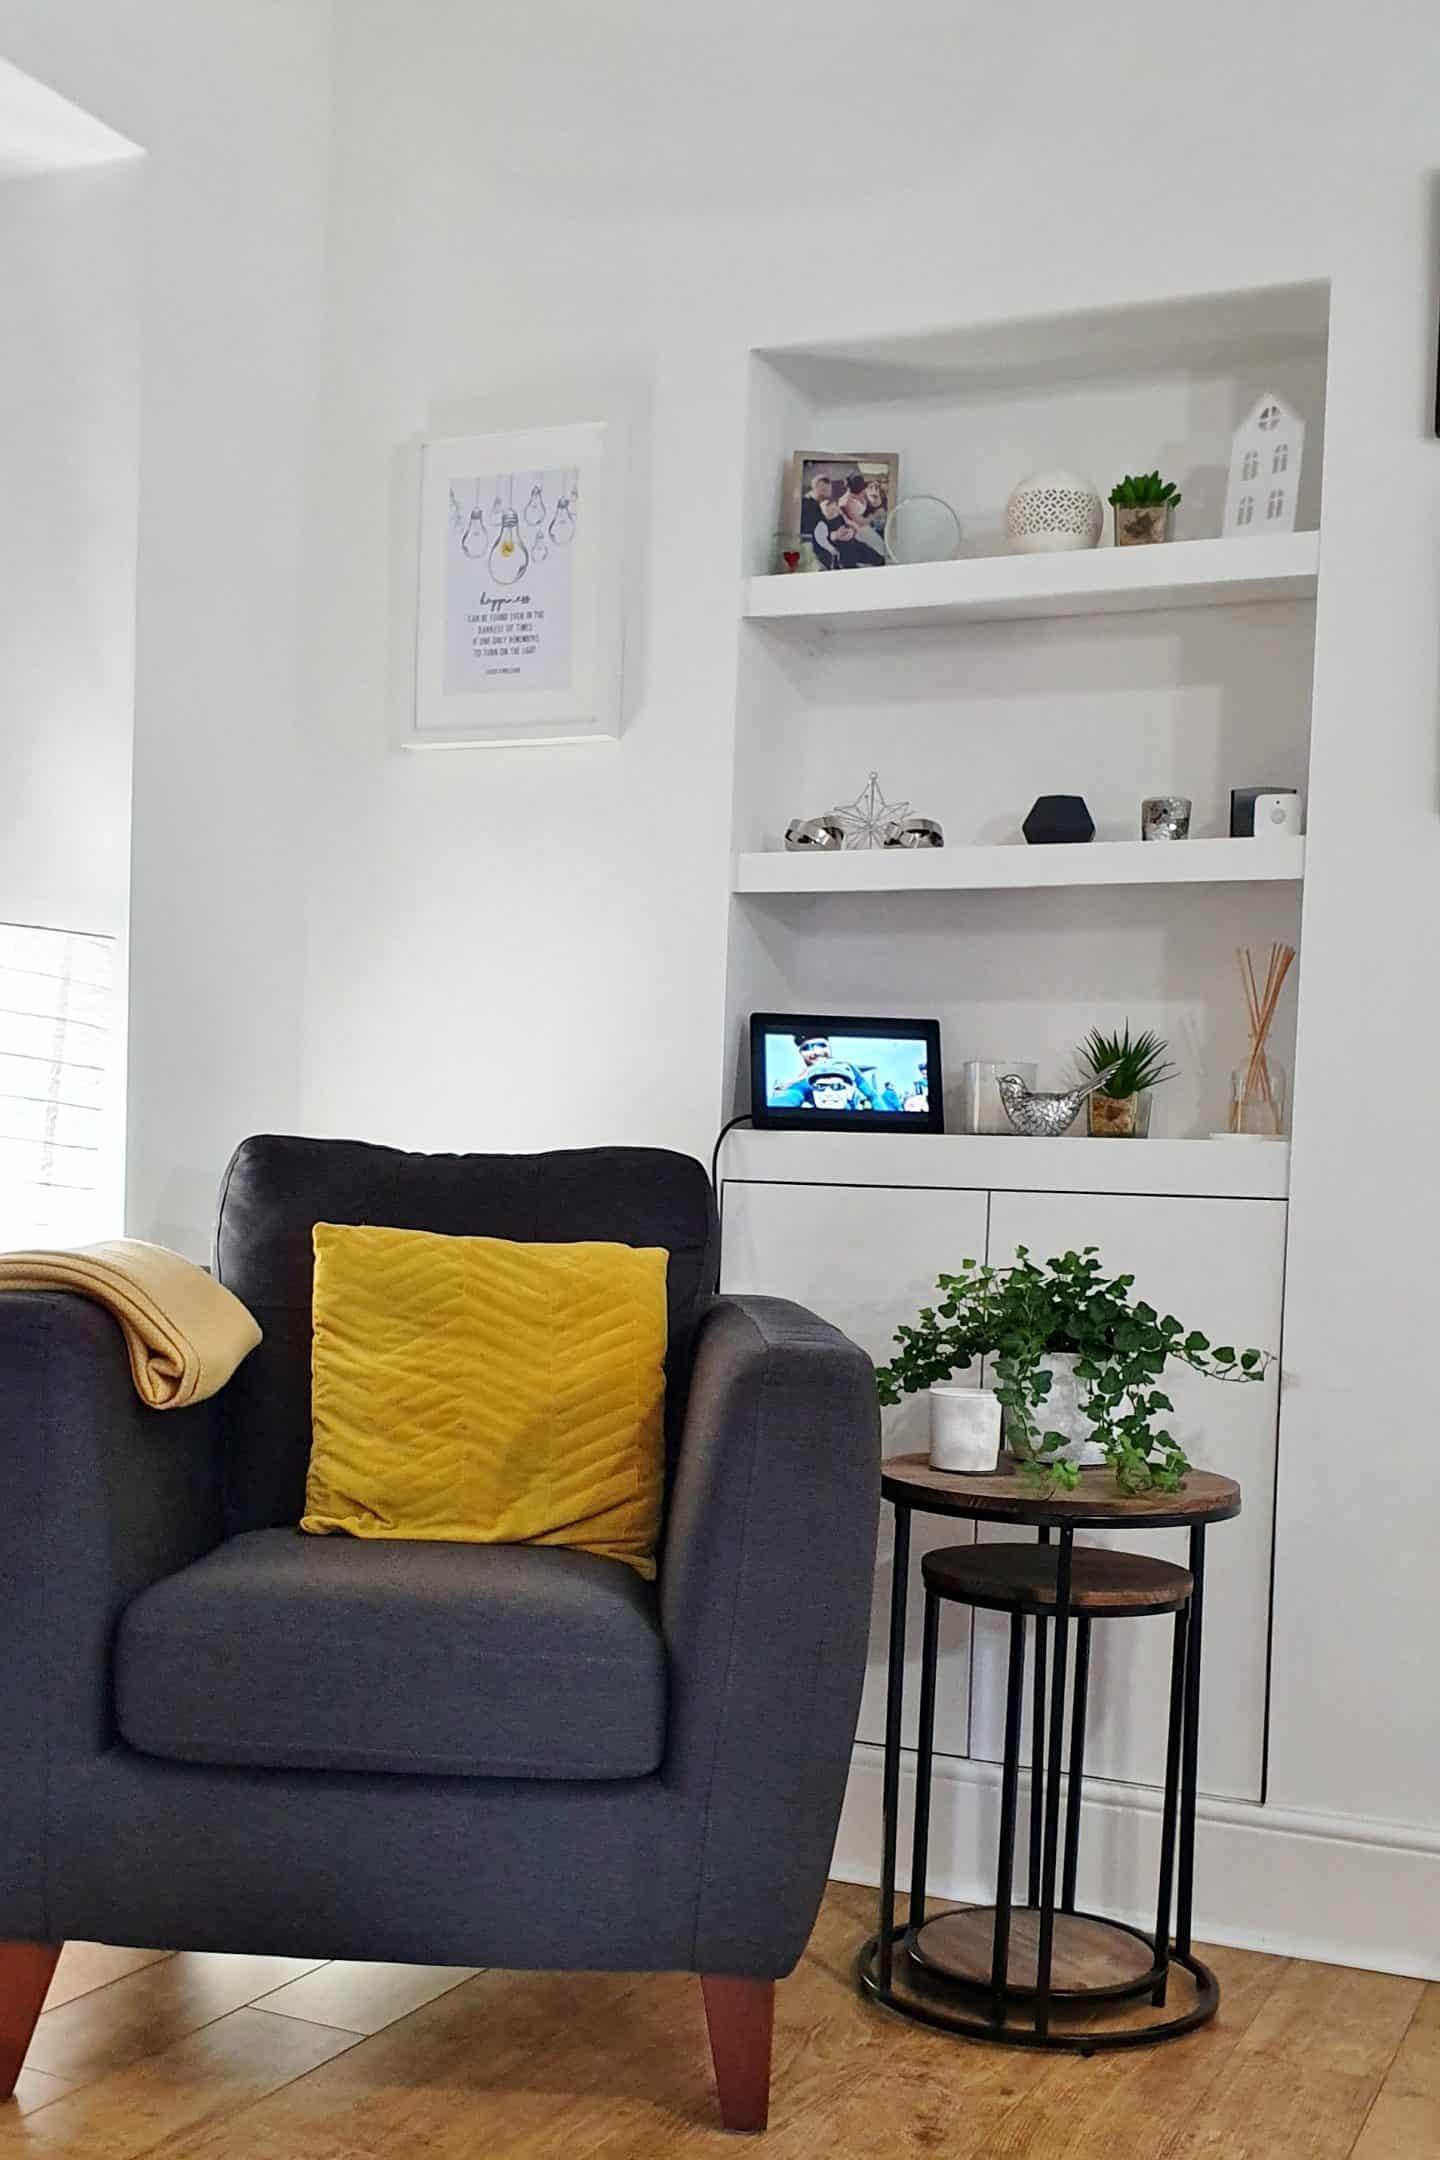 Nixplay Smart Photo Frame in living room